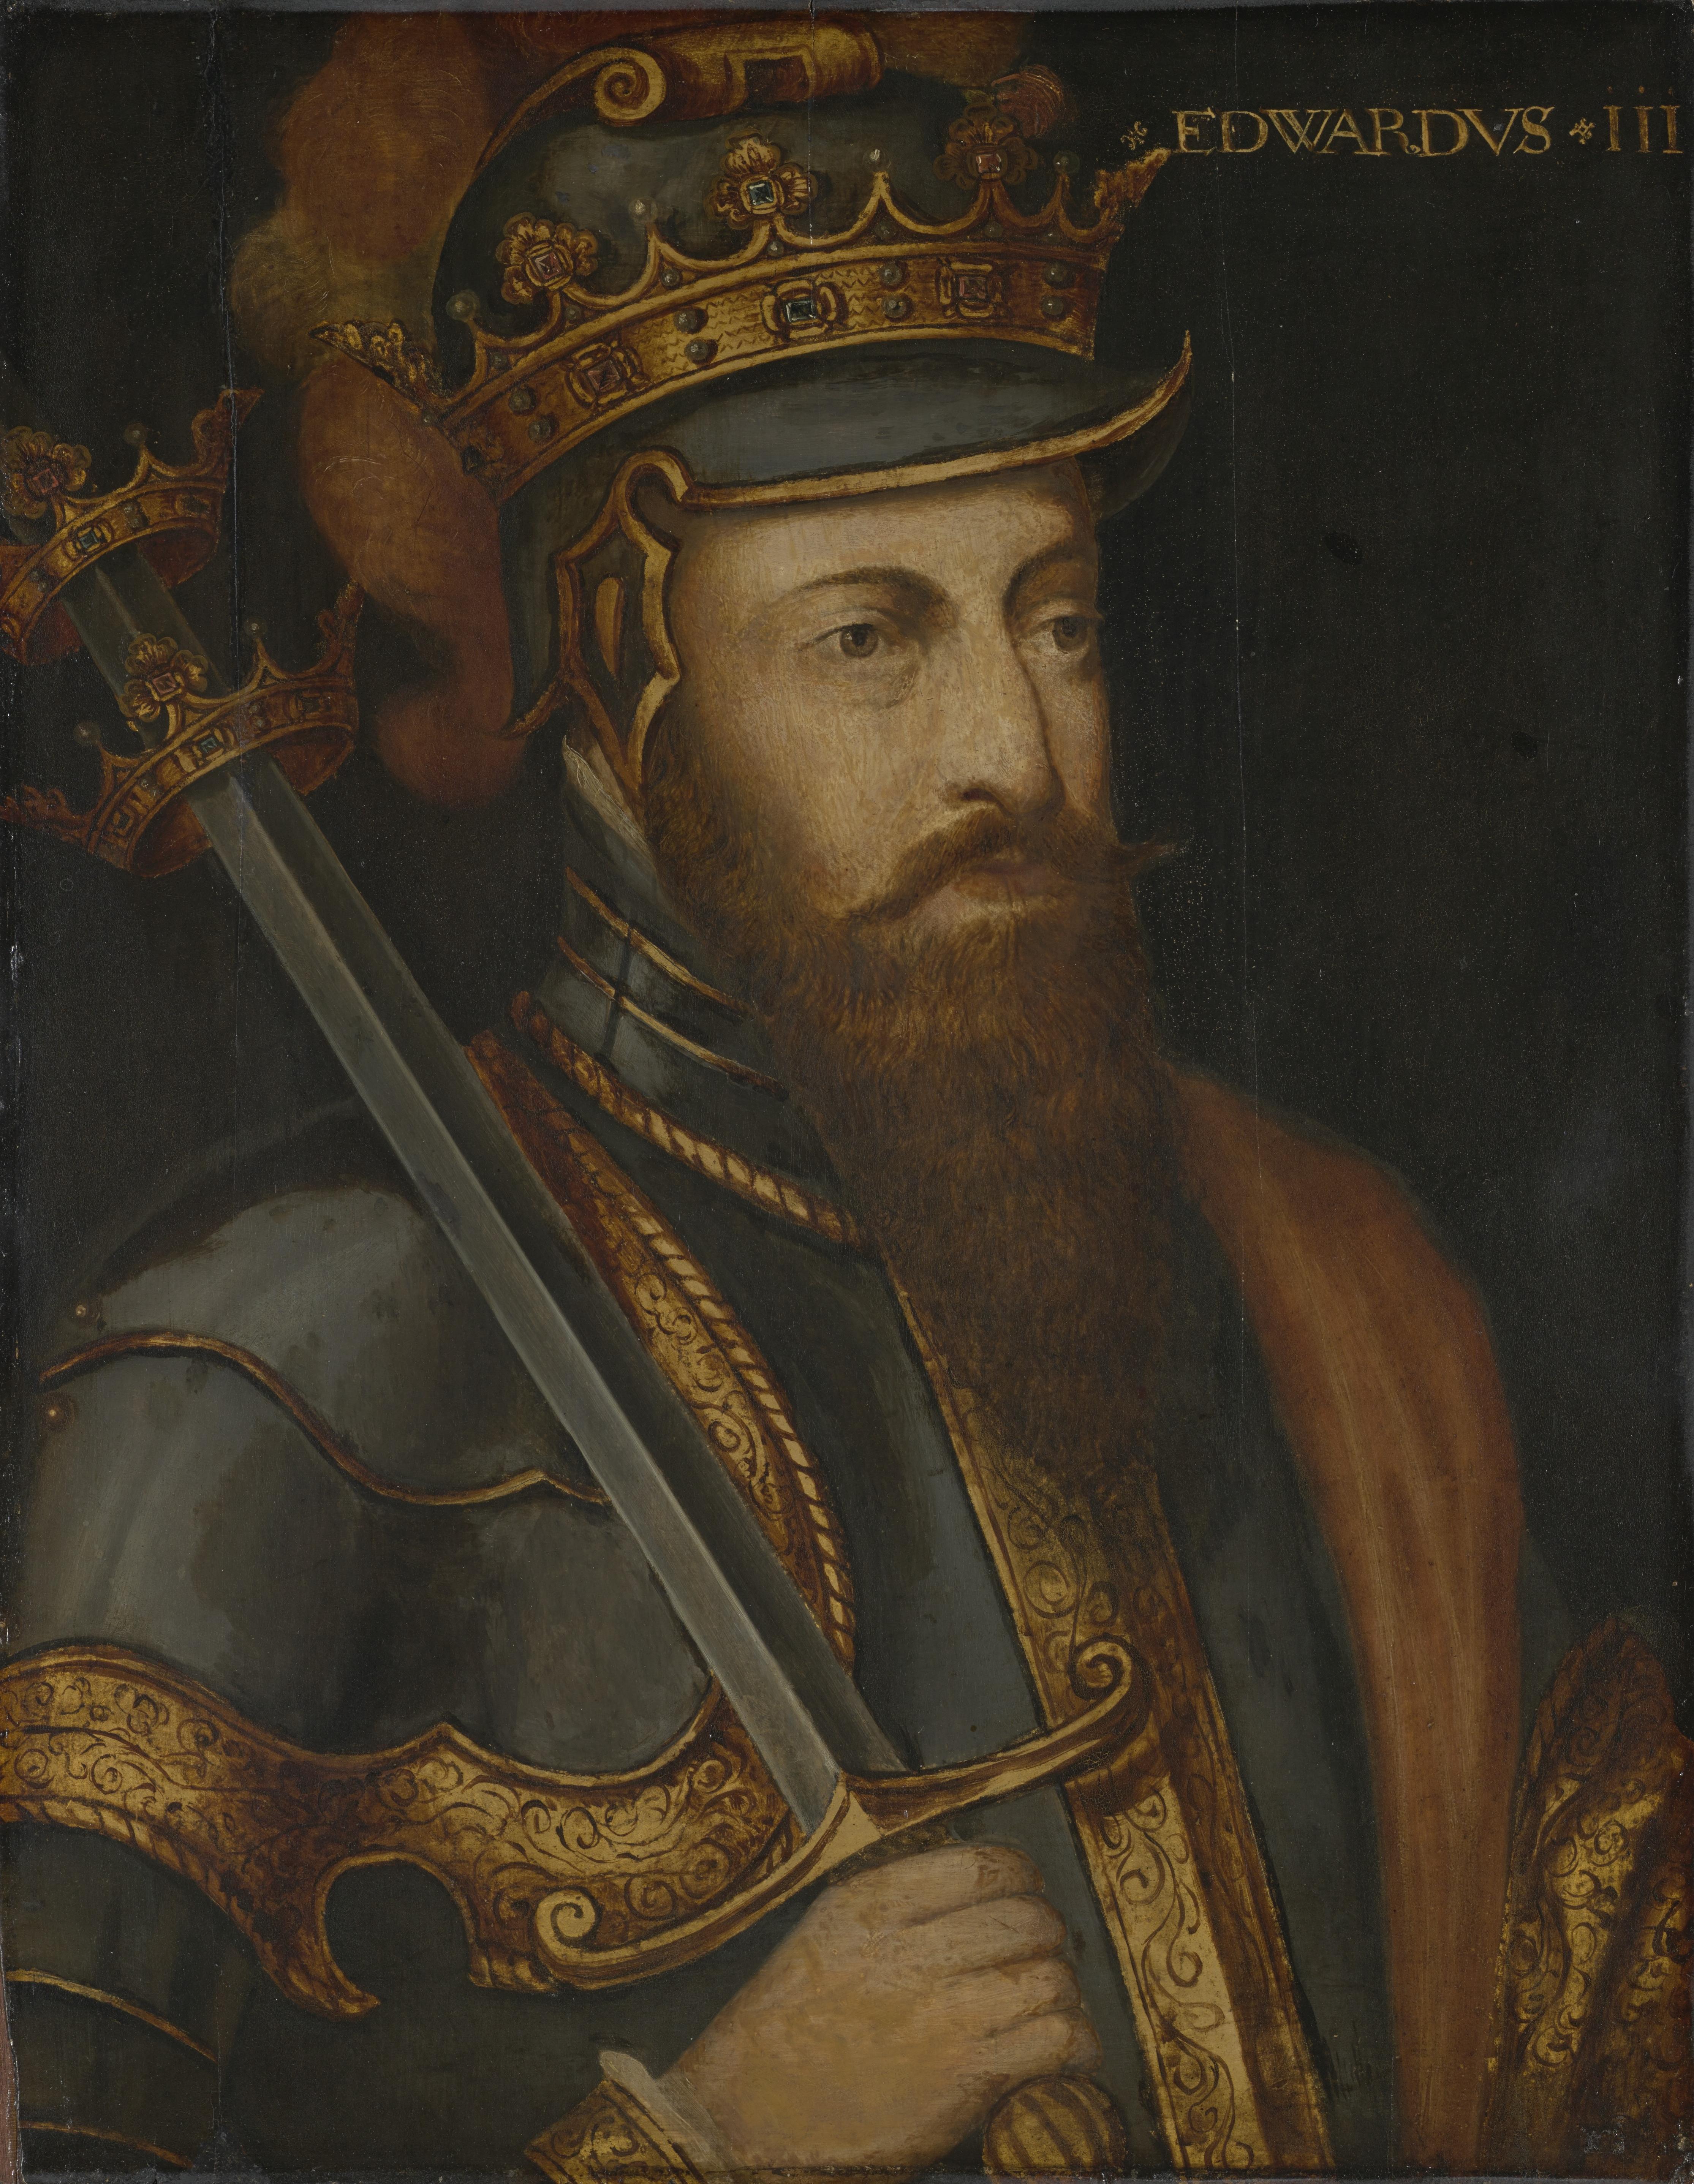 File:Edward III (18th century).jpg - Wikimedia Commons